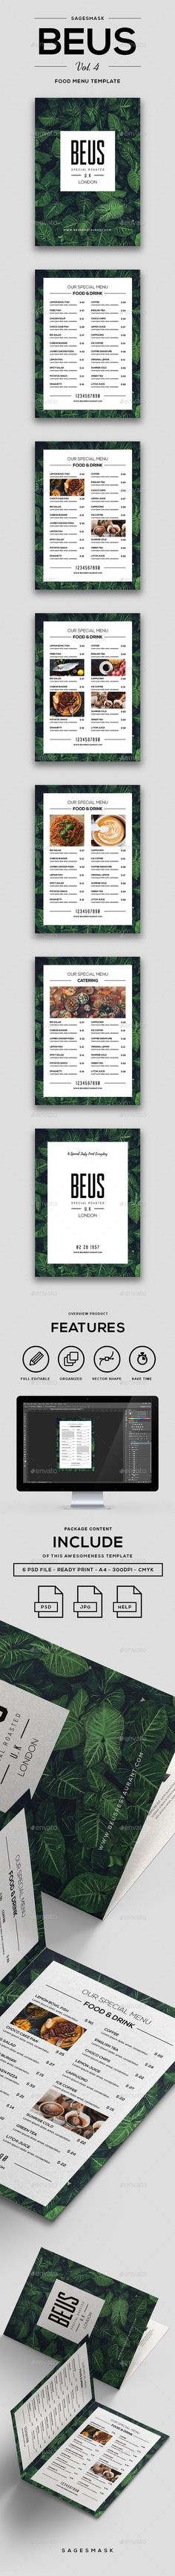 Minimal Food Menu Beus - Food Menus Print Templates Download here : https://graphicriver.net/item/minimal-food-menu-beus/19218671?s_rank=84&ref=Al-fatih